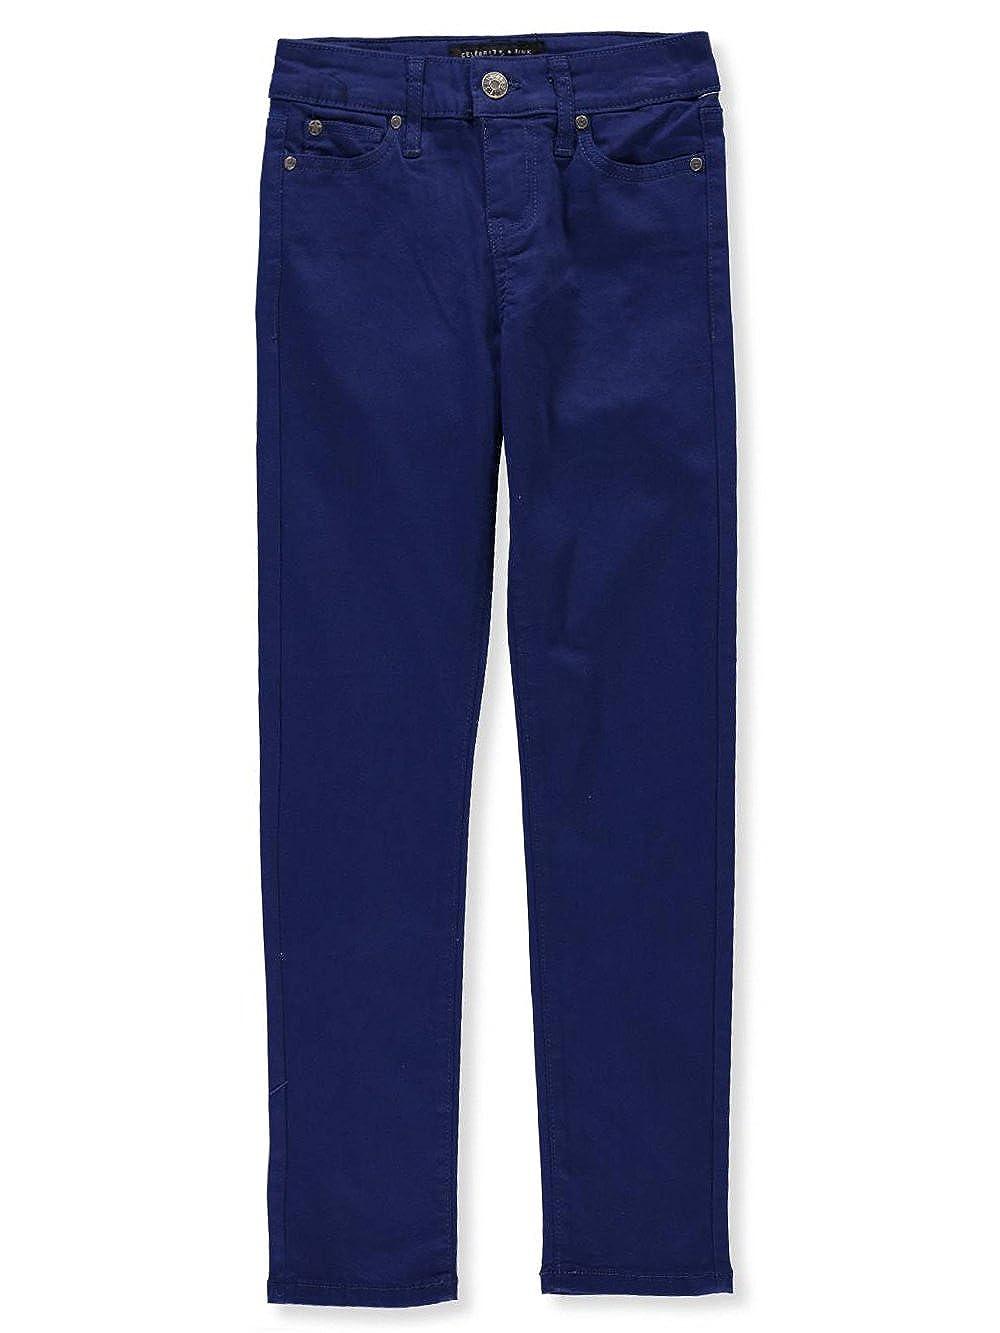 CelebrityPink Girls' Stretch Twill Jeans Celebrity Pink